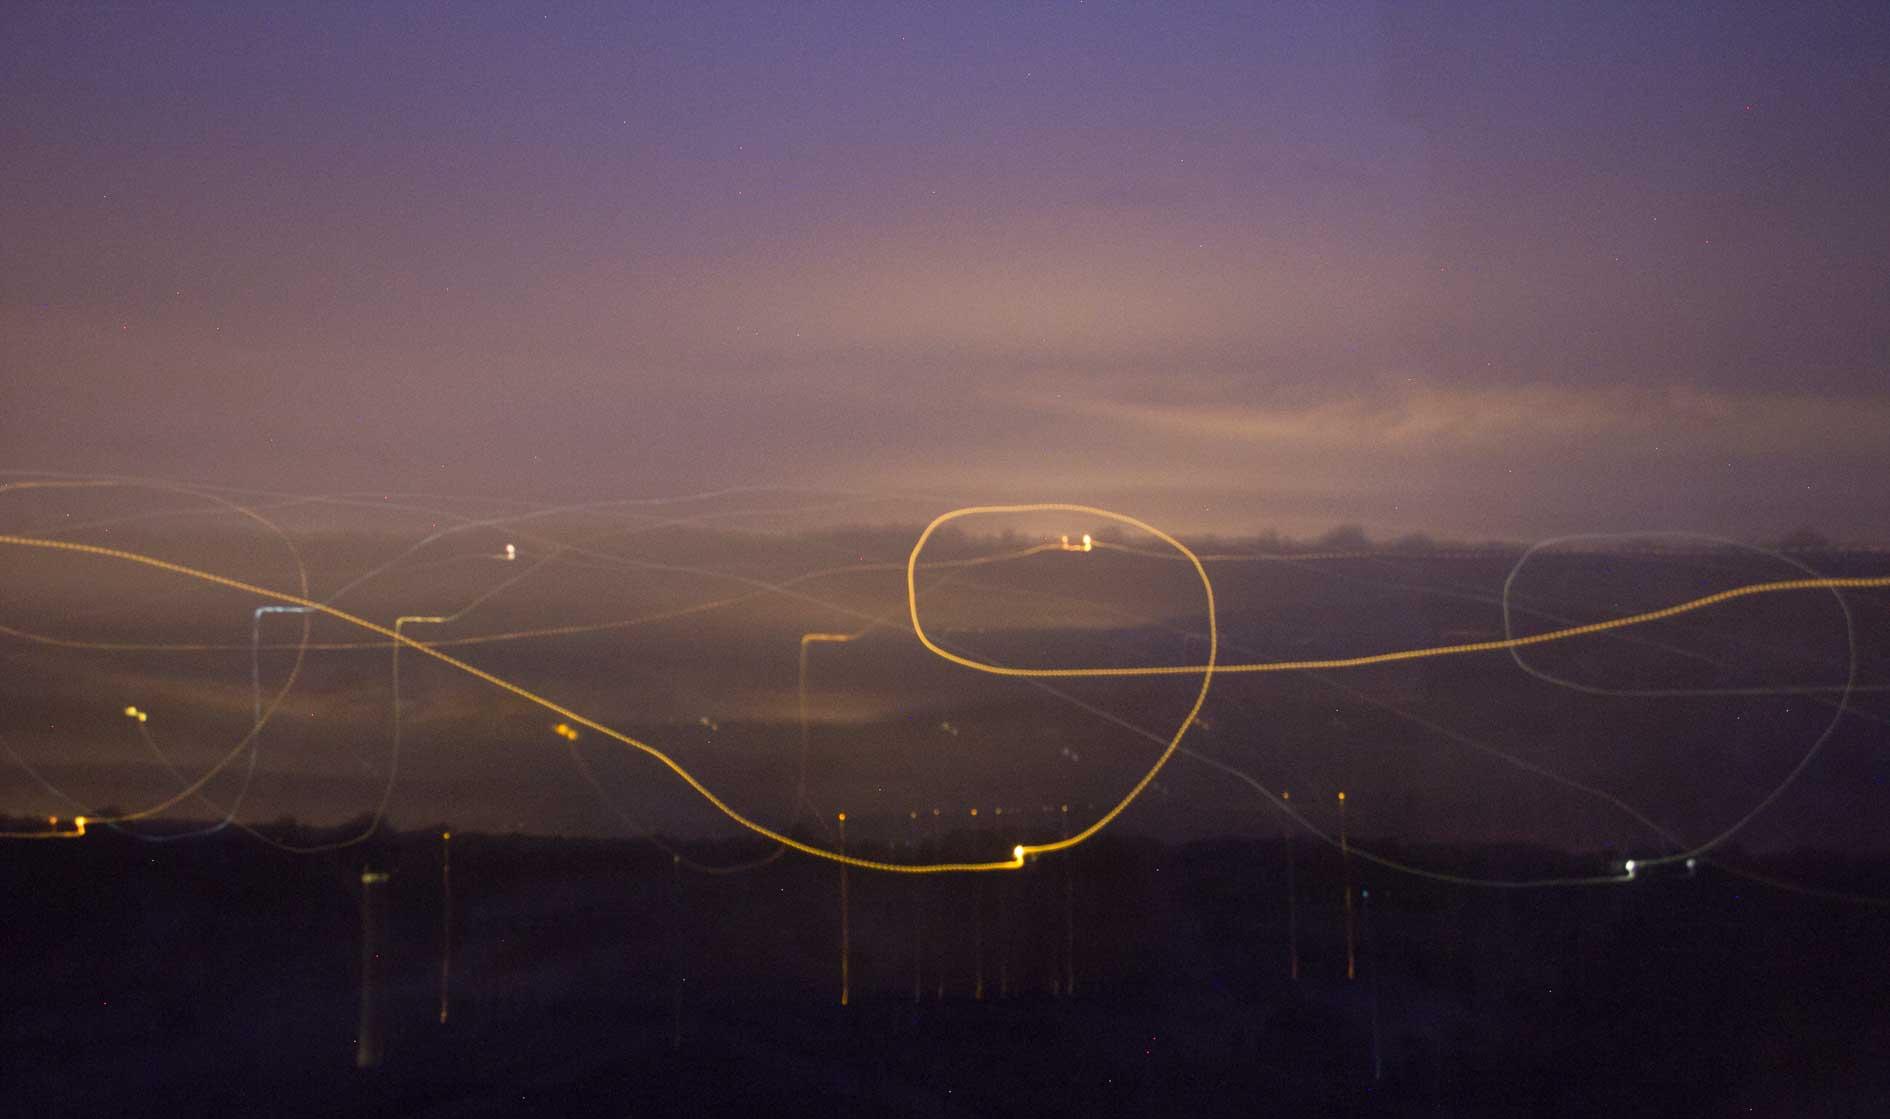 aurora-and-light-painting-17.jpg